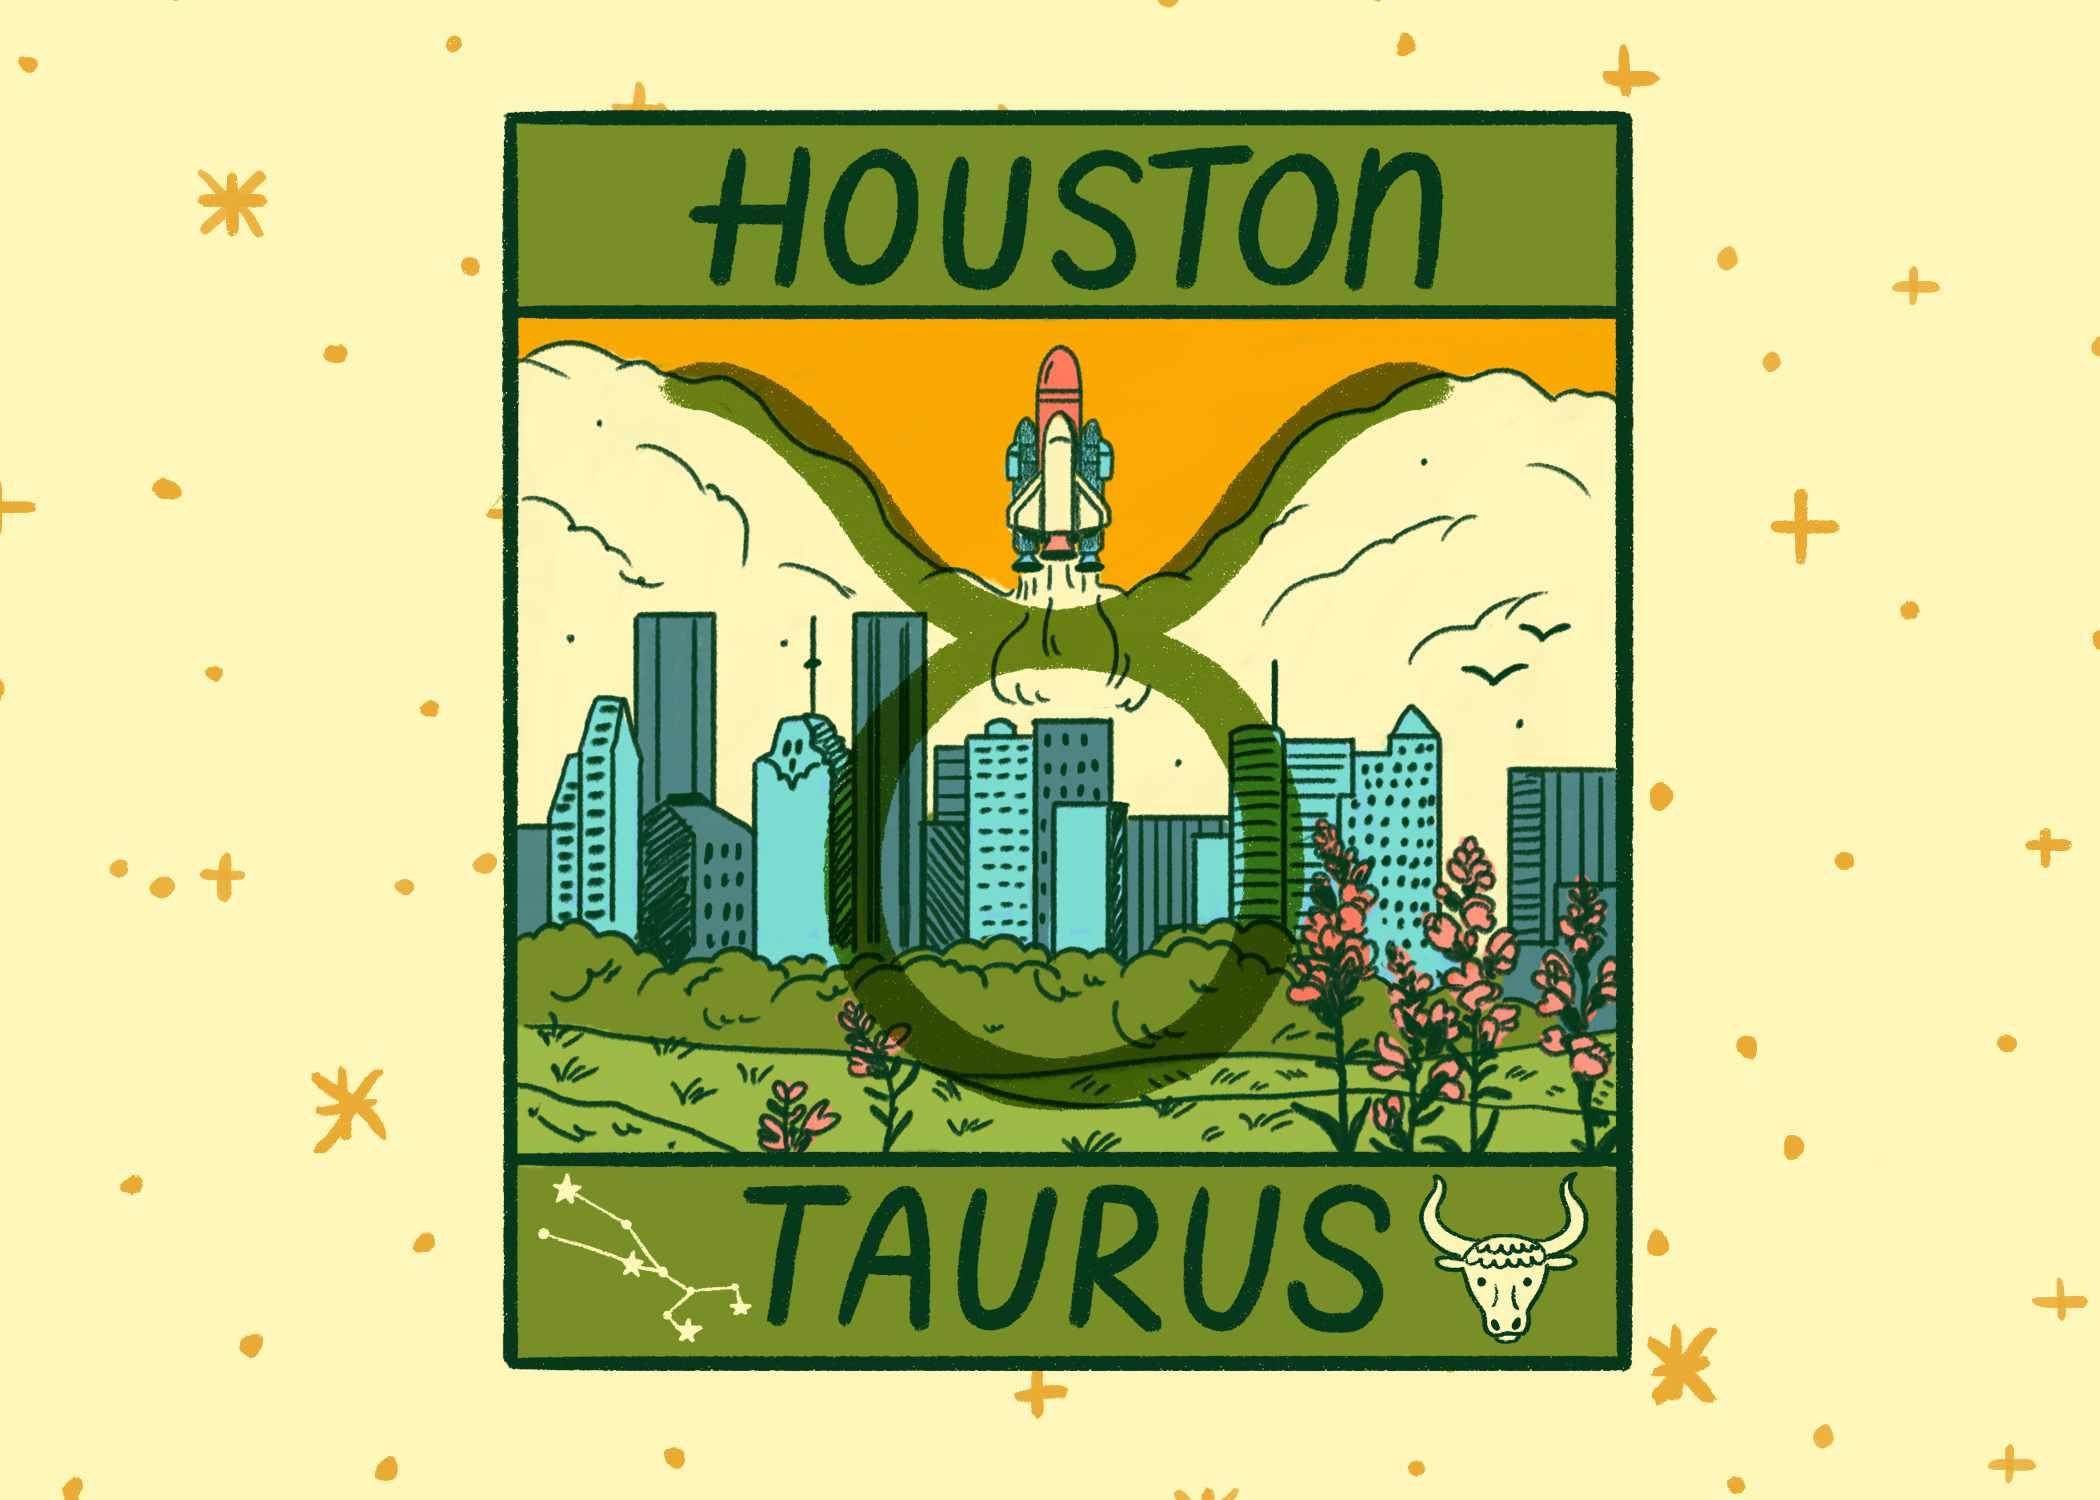 Illustration of Houston and Taurus